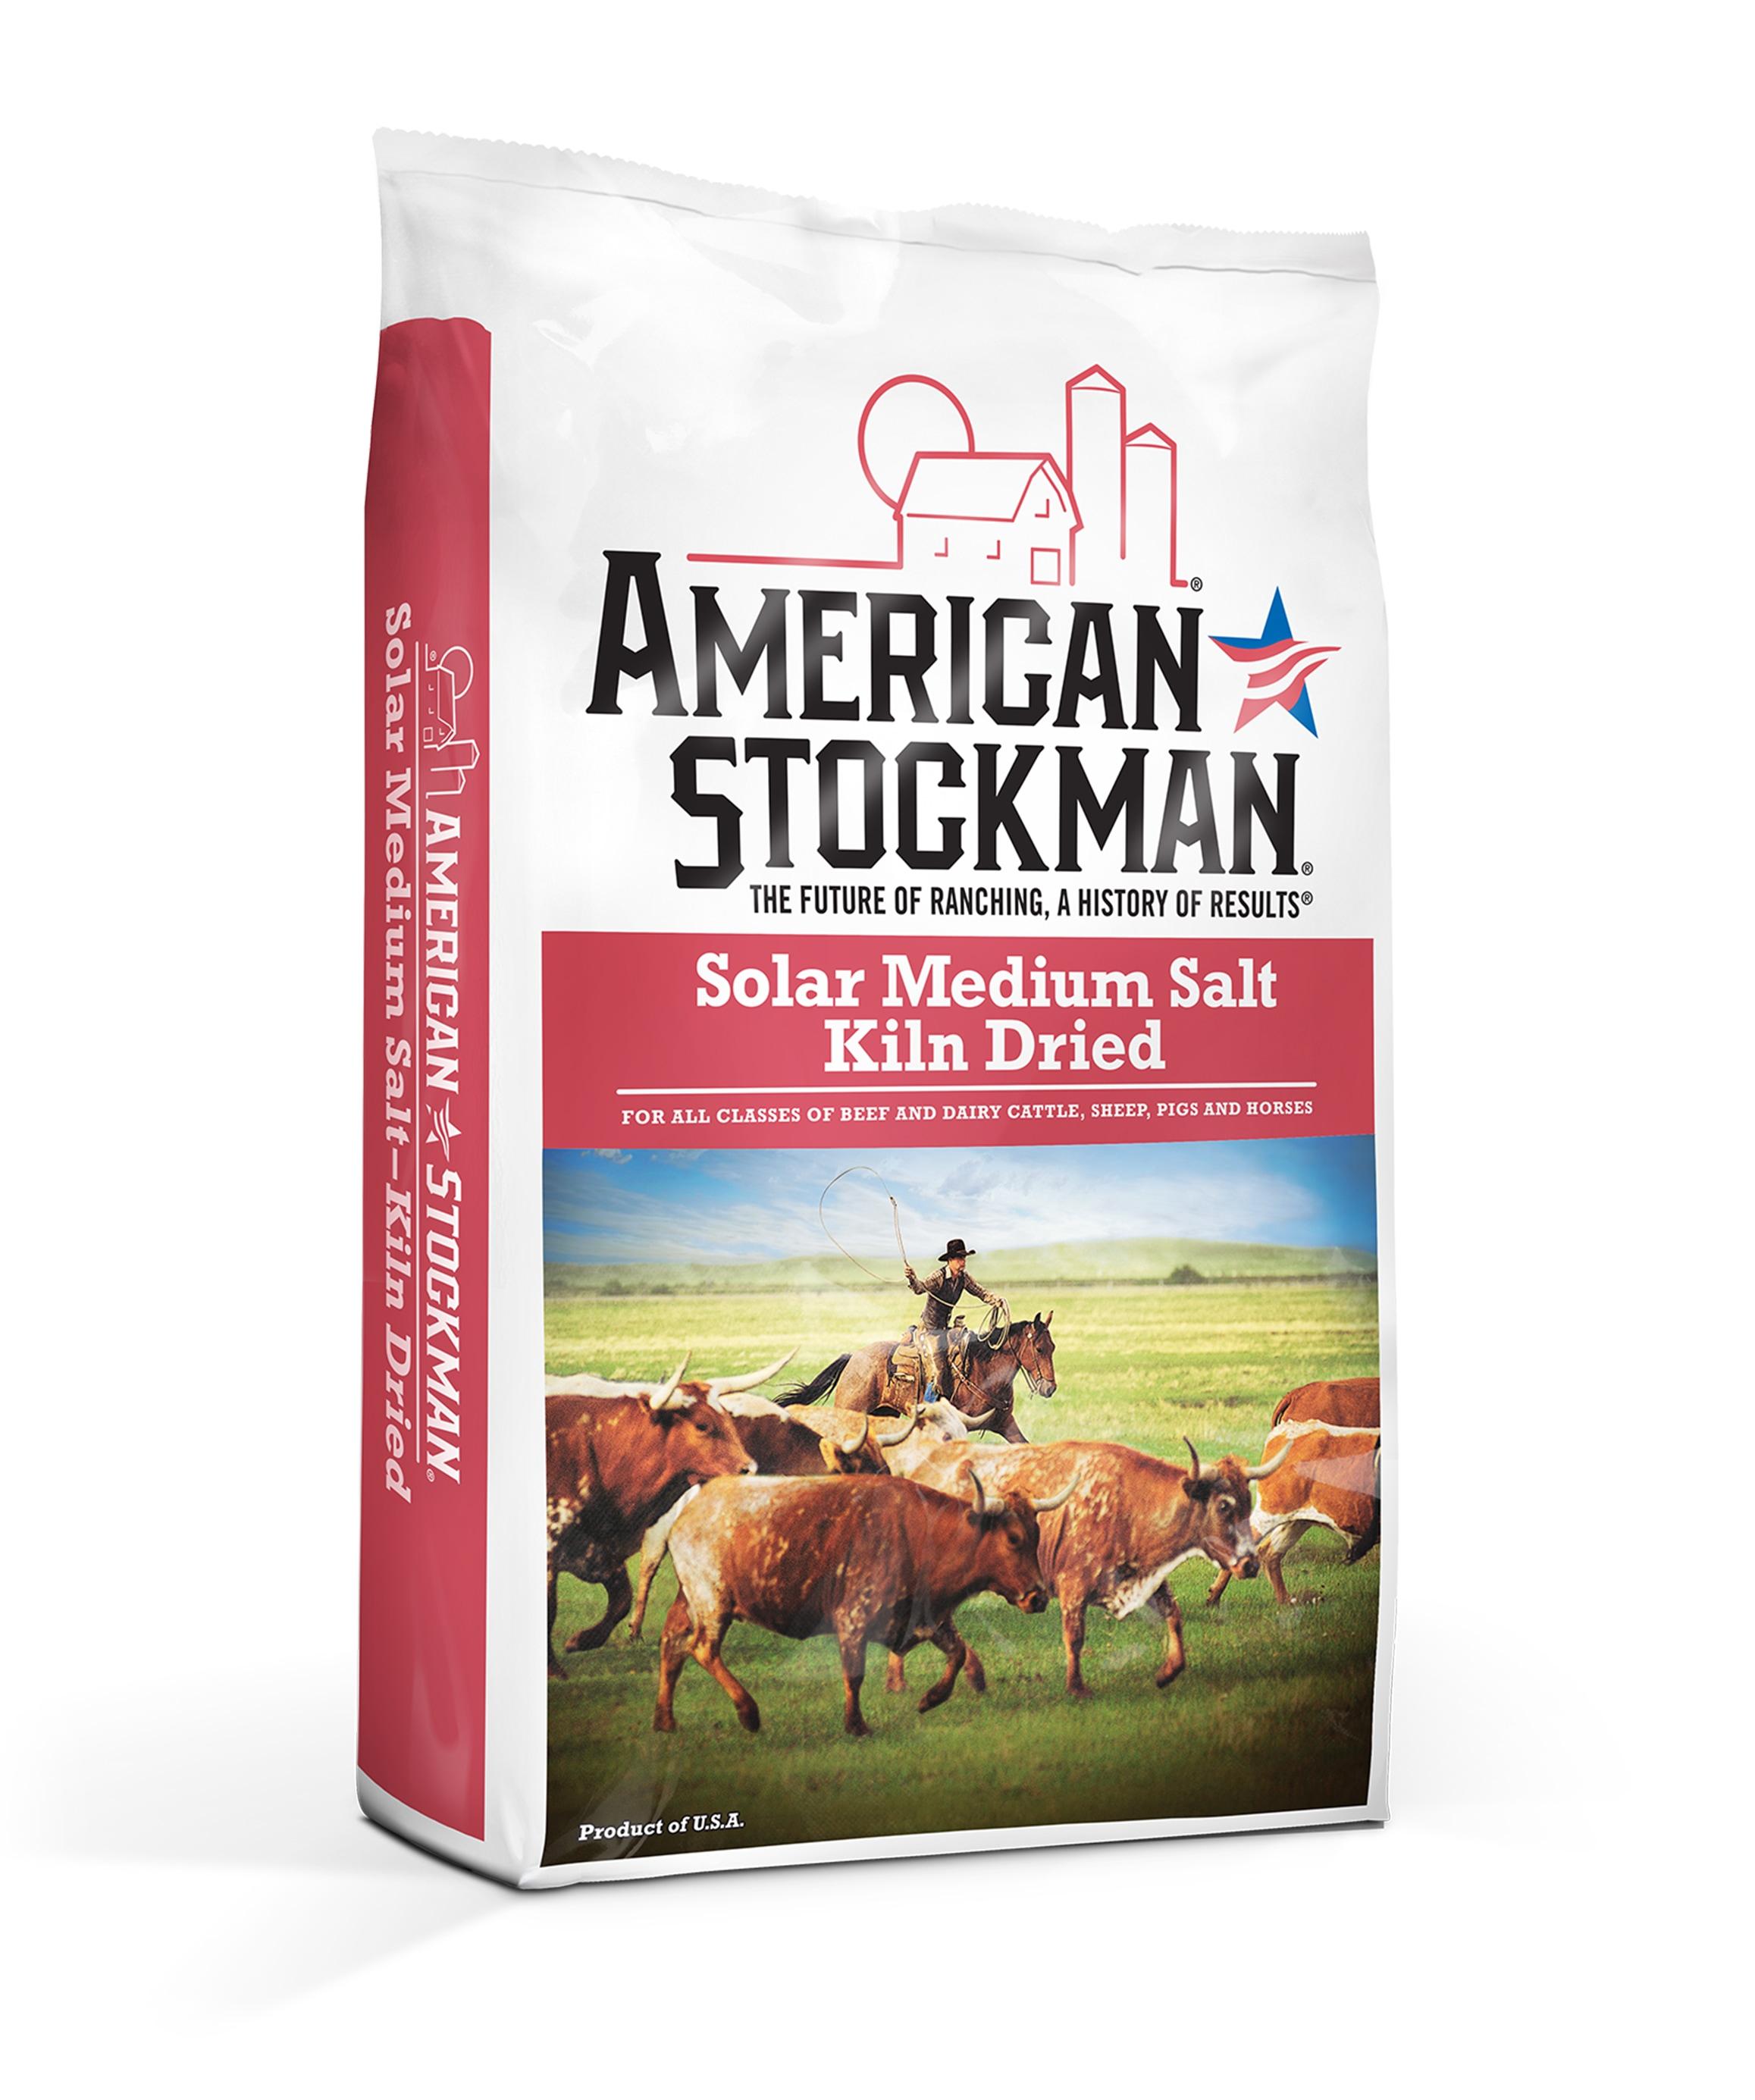 American Stockman® Solar Medium Salt, Kiln Dried Bag